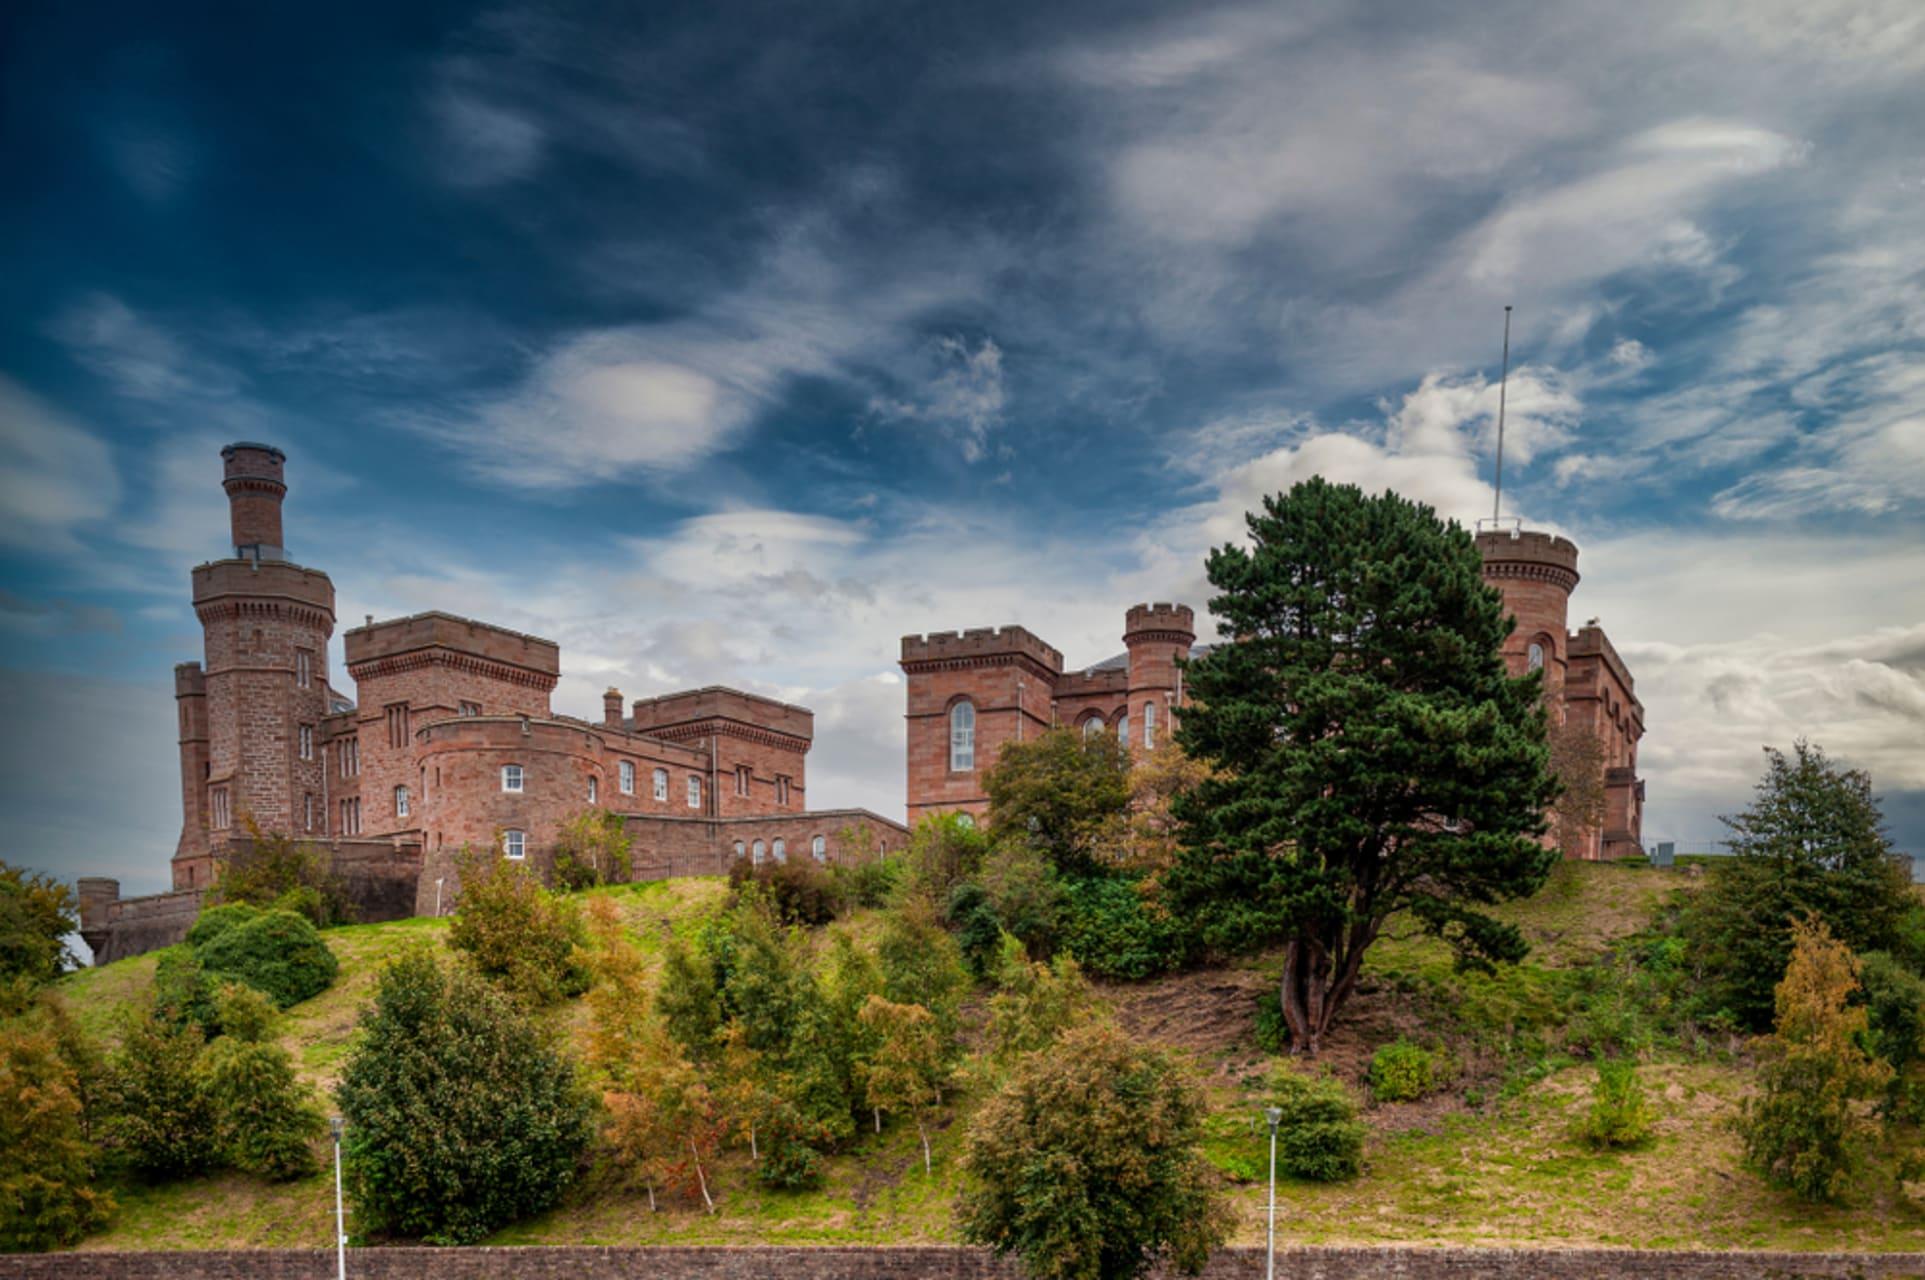 Inverness - Inverness: Part 1